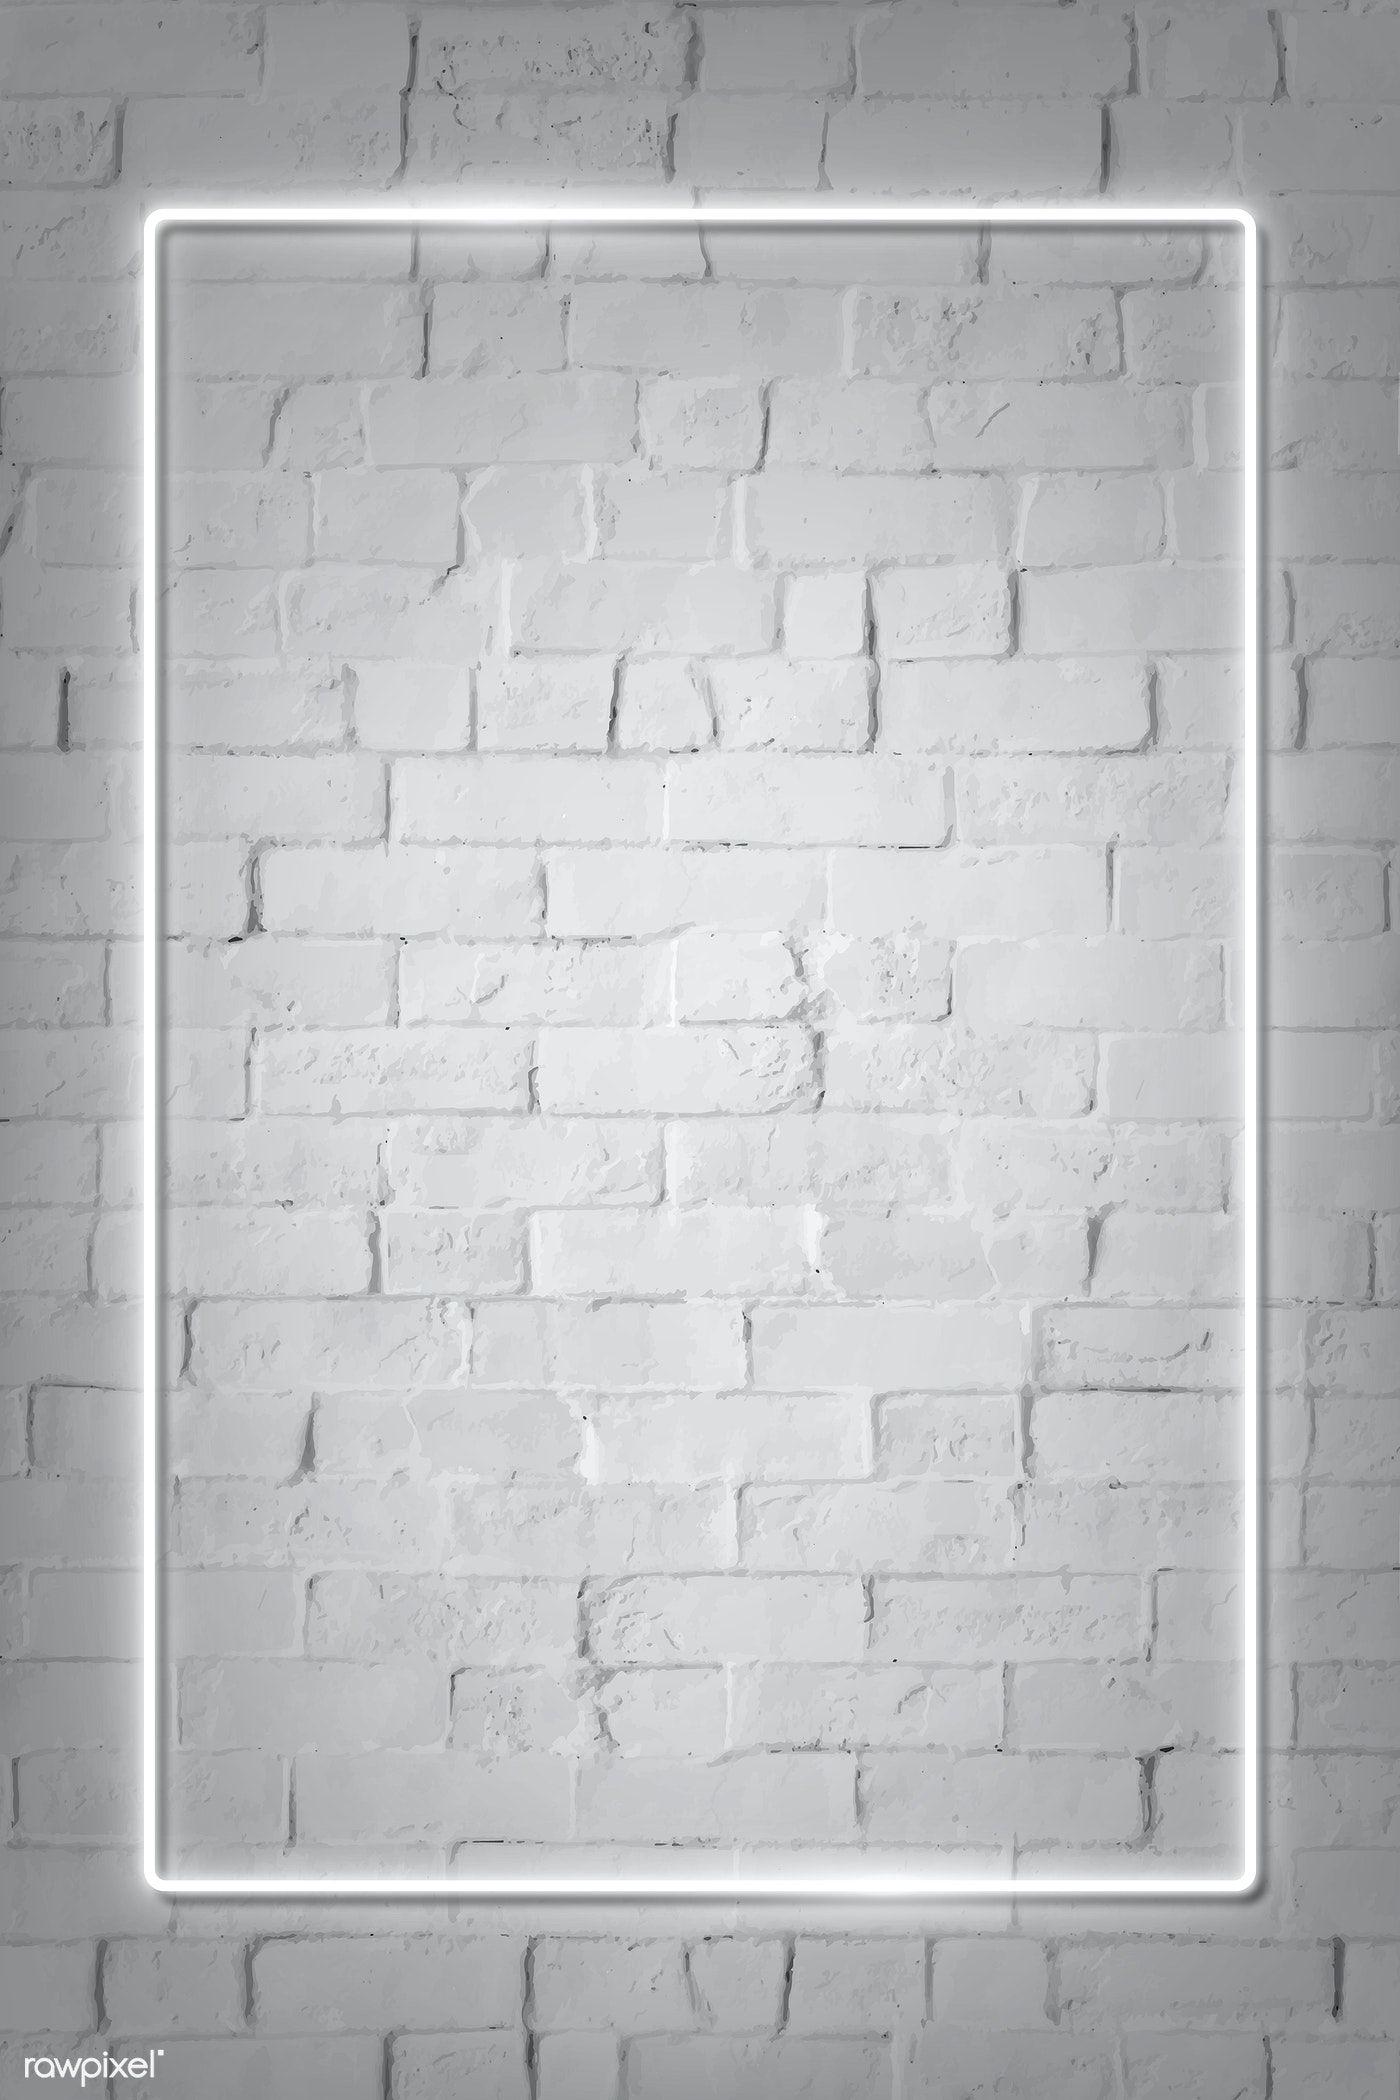 Download Premium Vector Of Rectangle White Neon Frame On A White Brick White Brick Walls Neon Wallpaper Framed Wallpaper